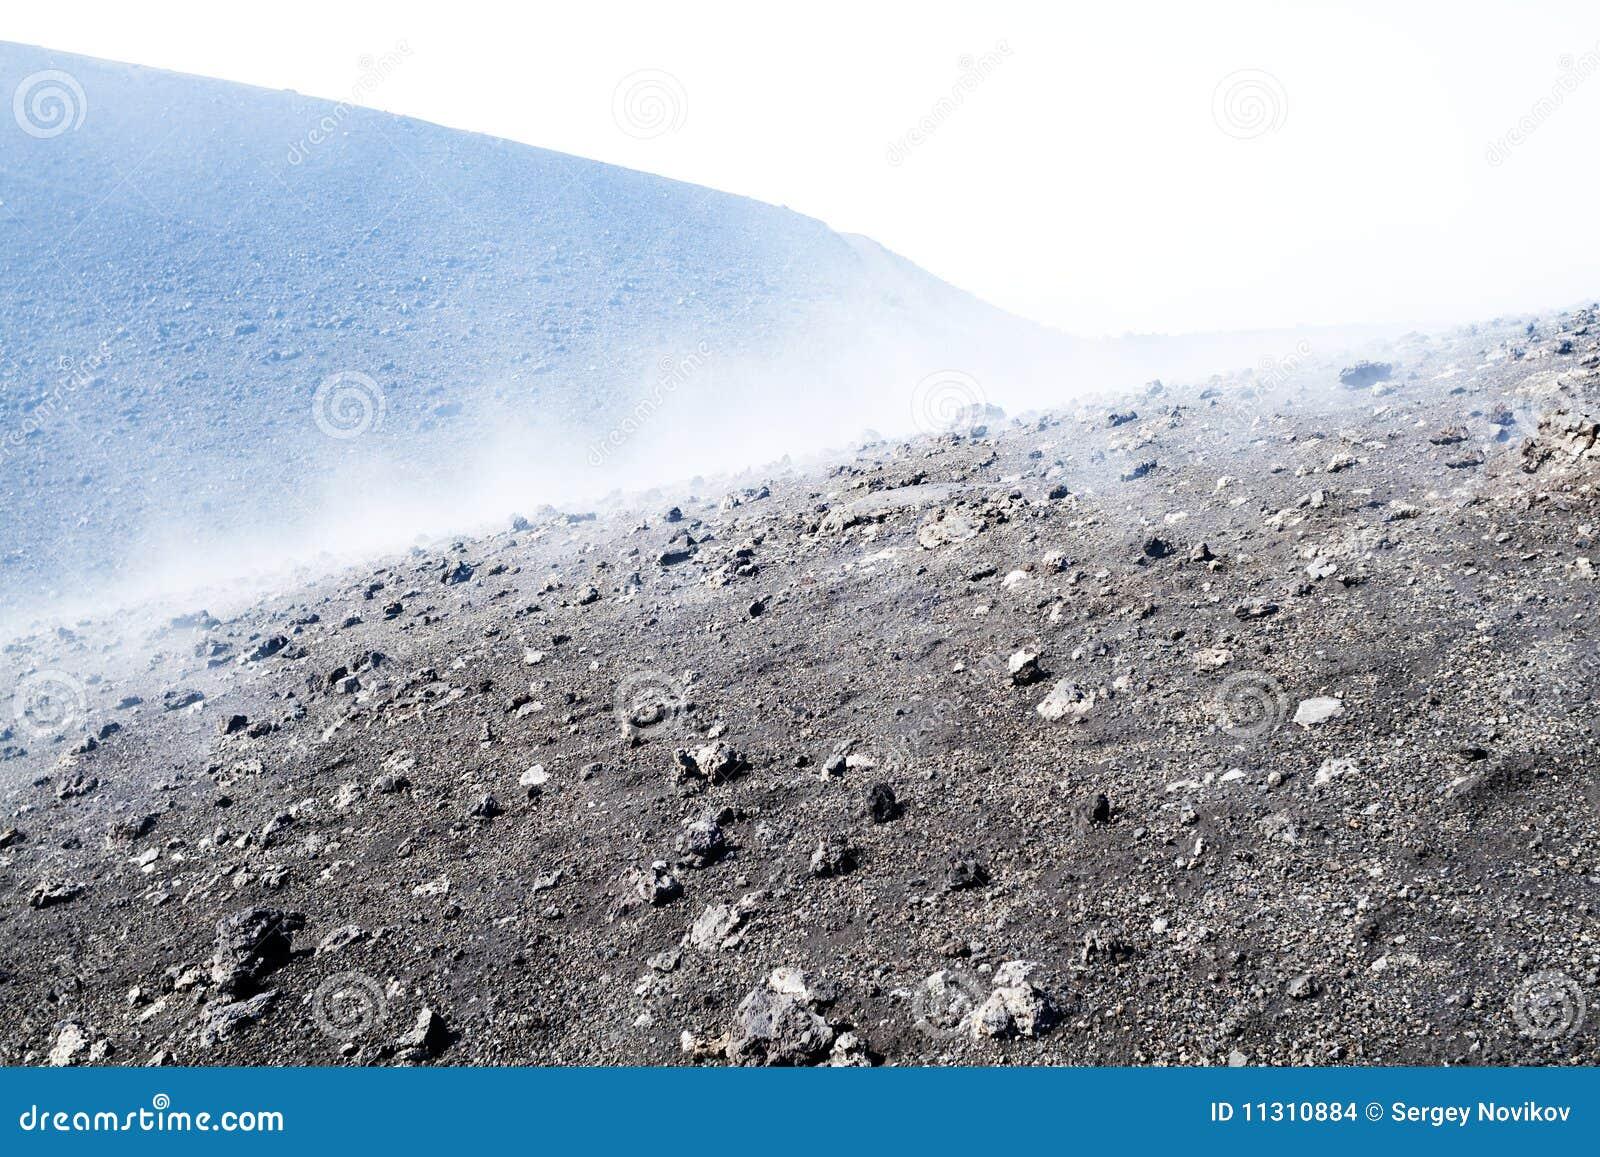 Vulkanische Aschenoberfläche, Wolken